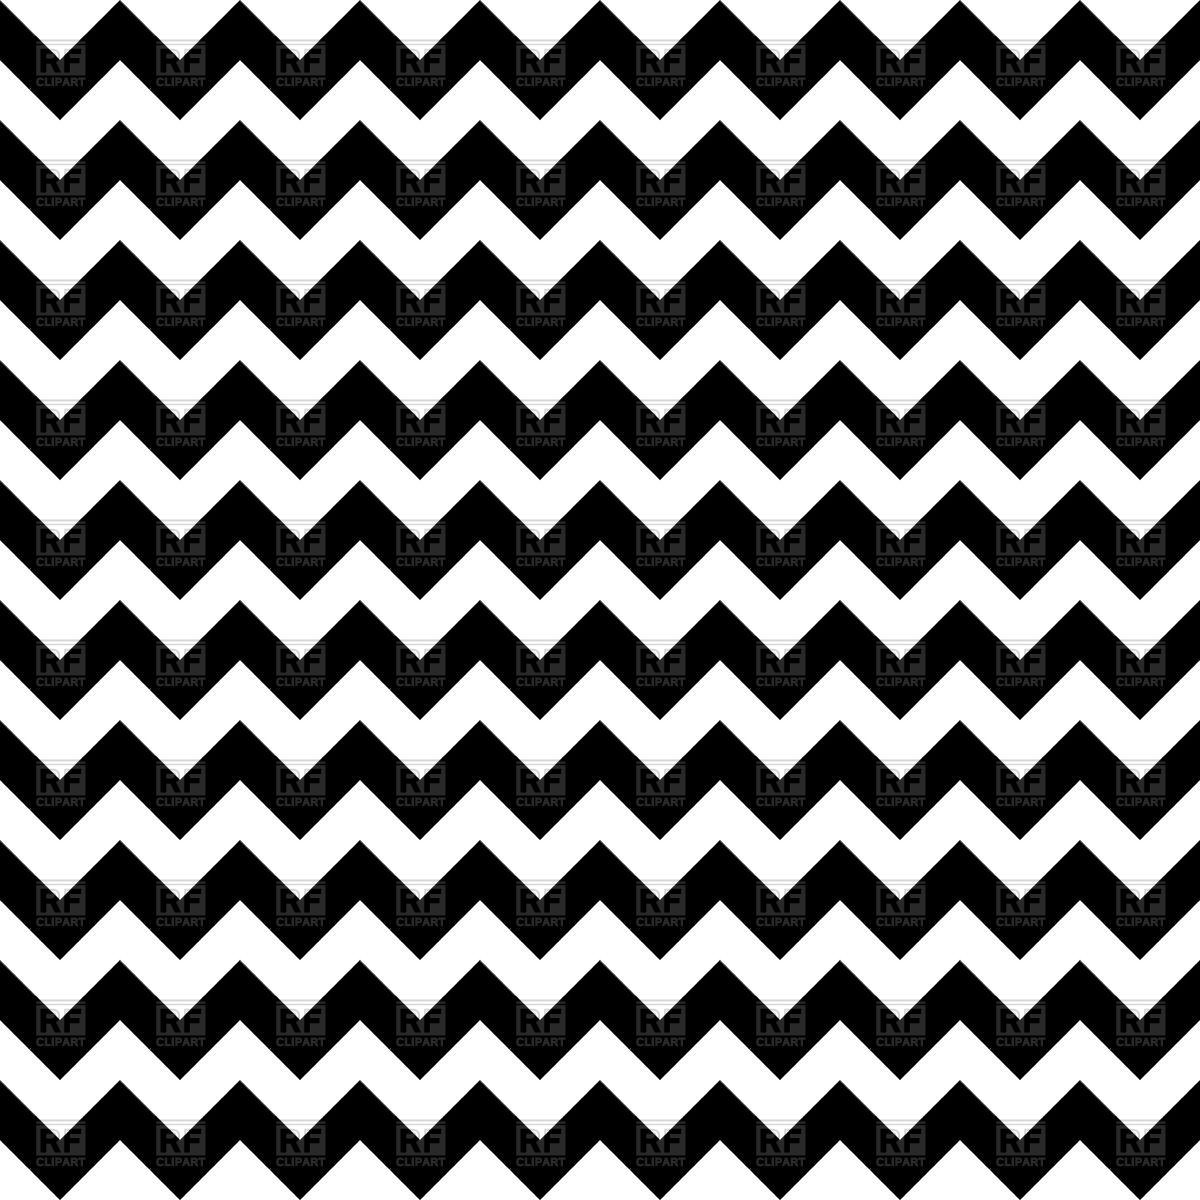 Chevron pattern clipart.